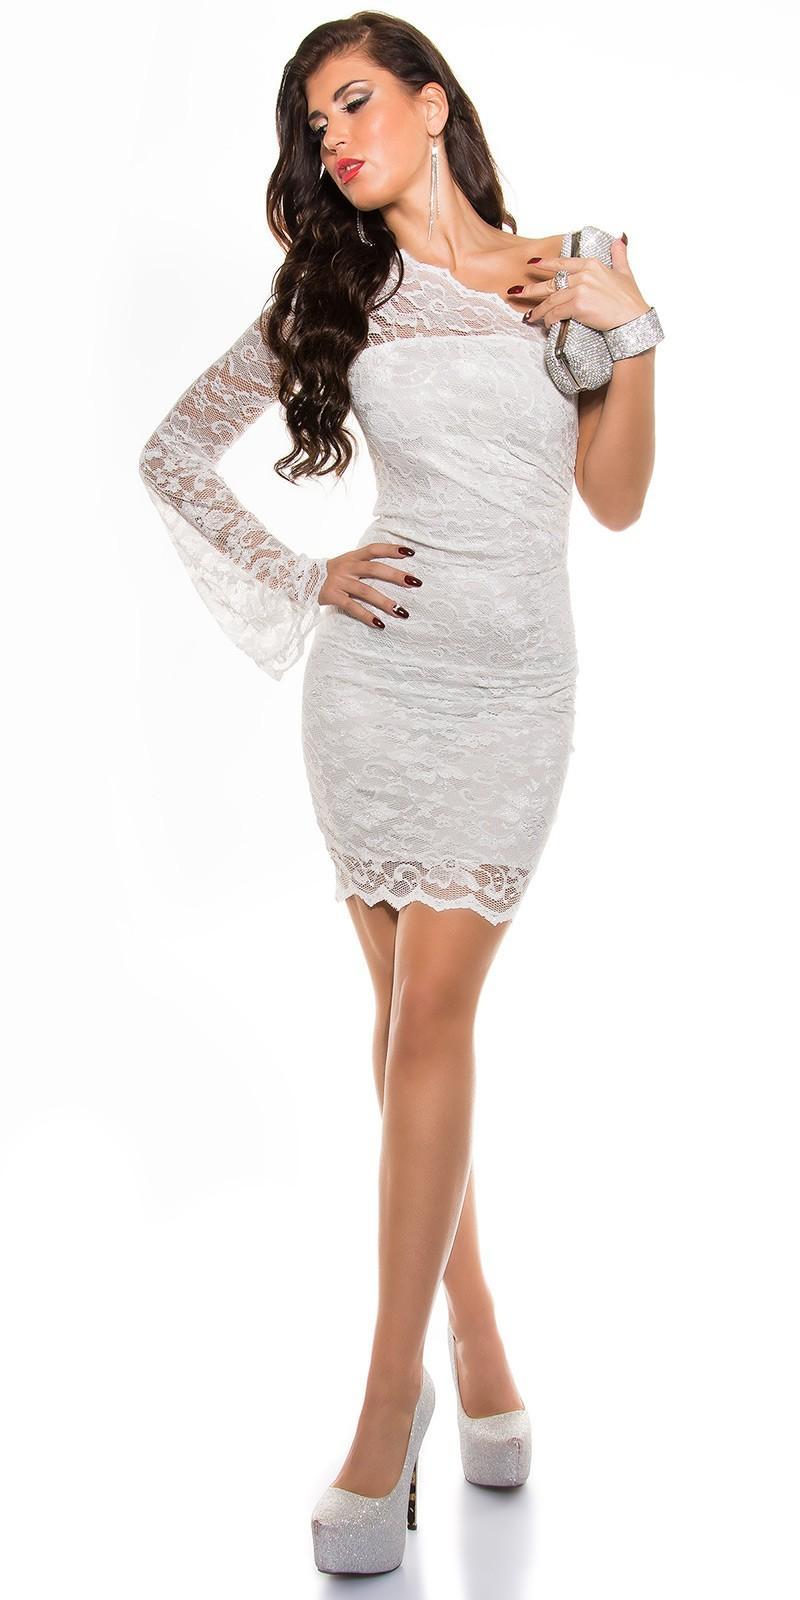 Vestidos de moda blanco de encaje ceñido